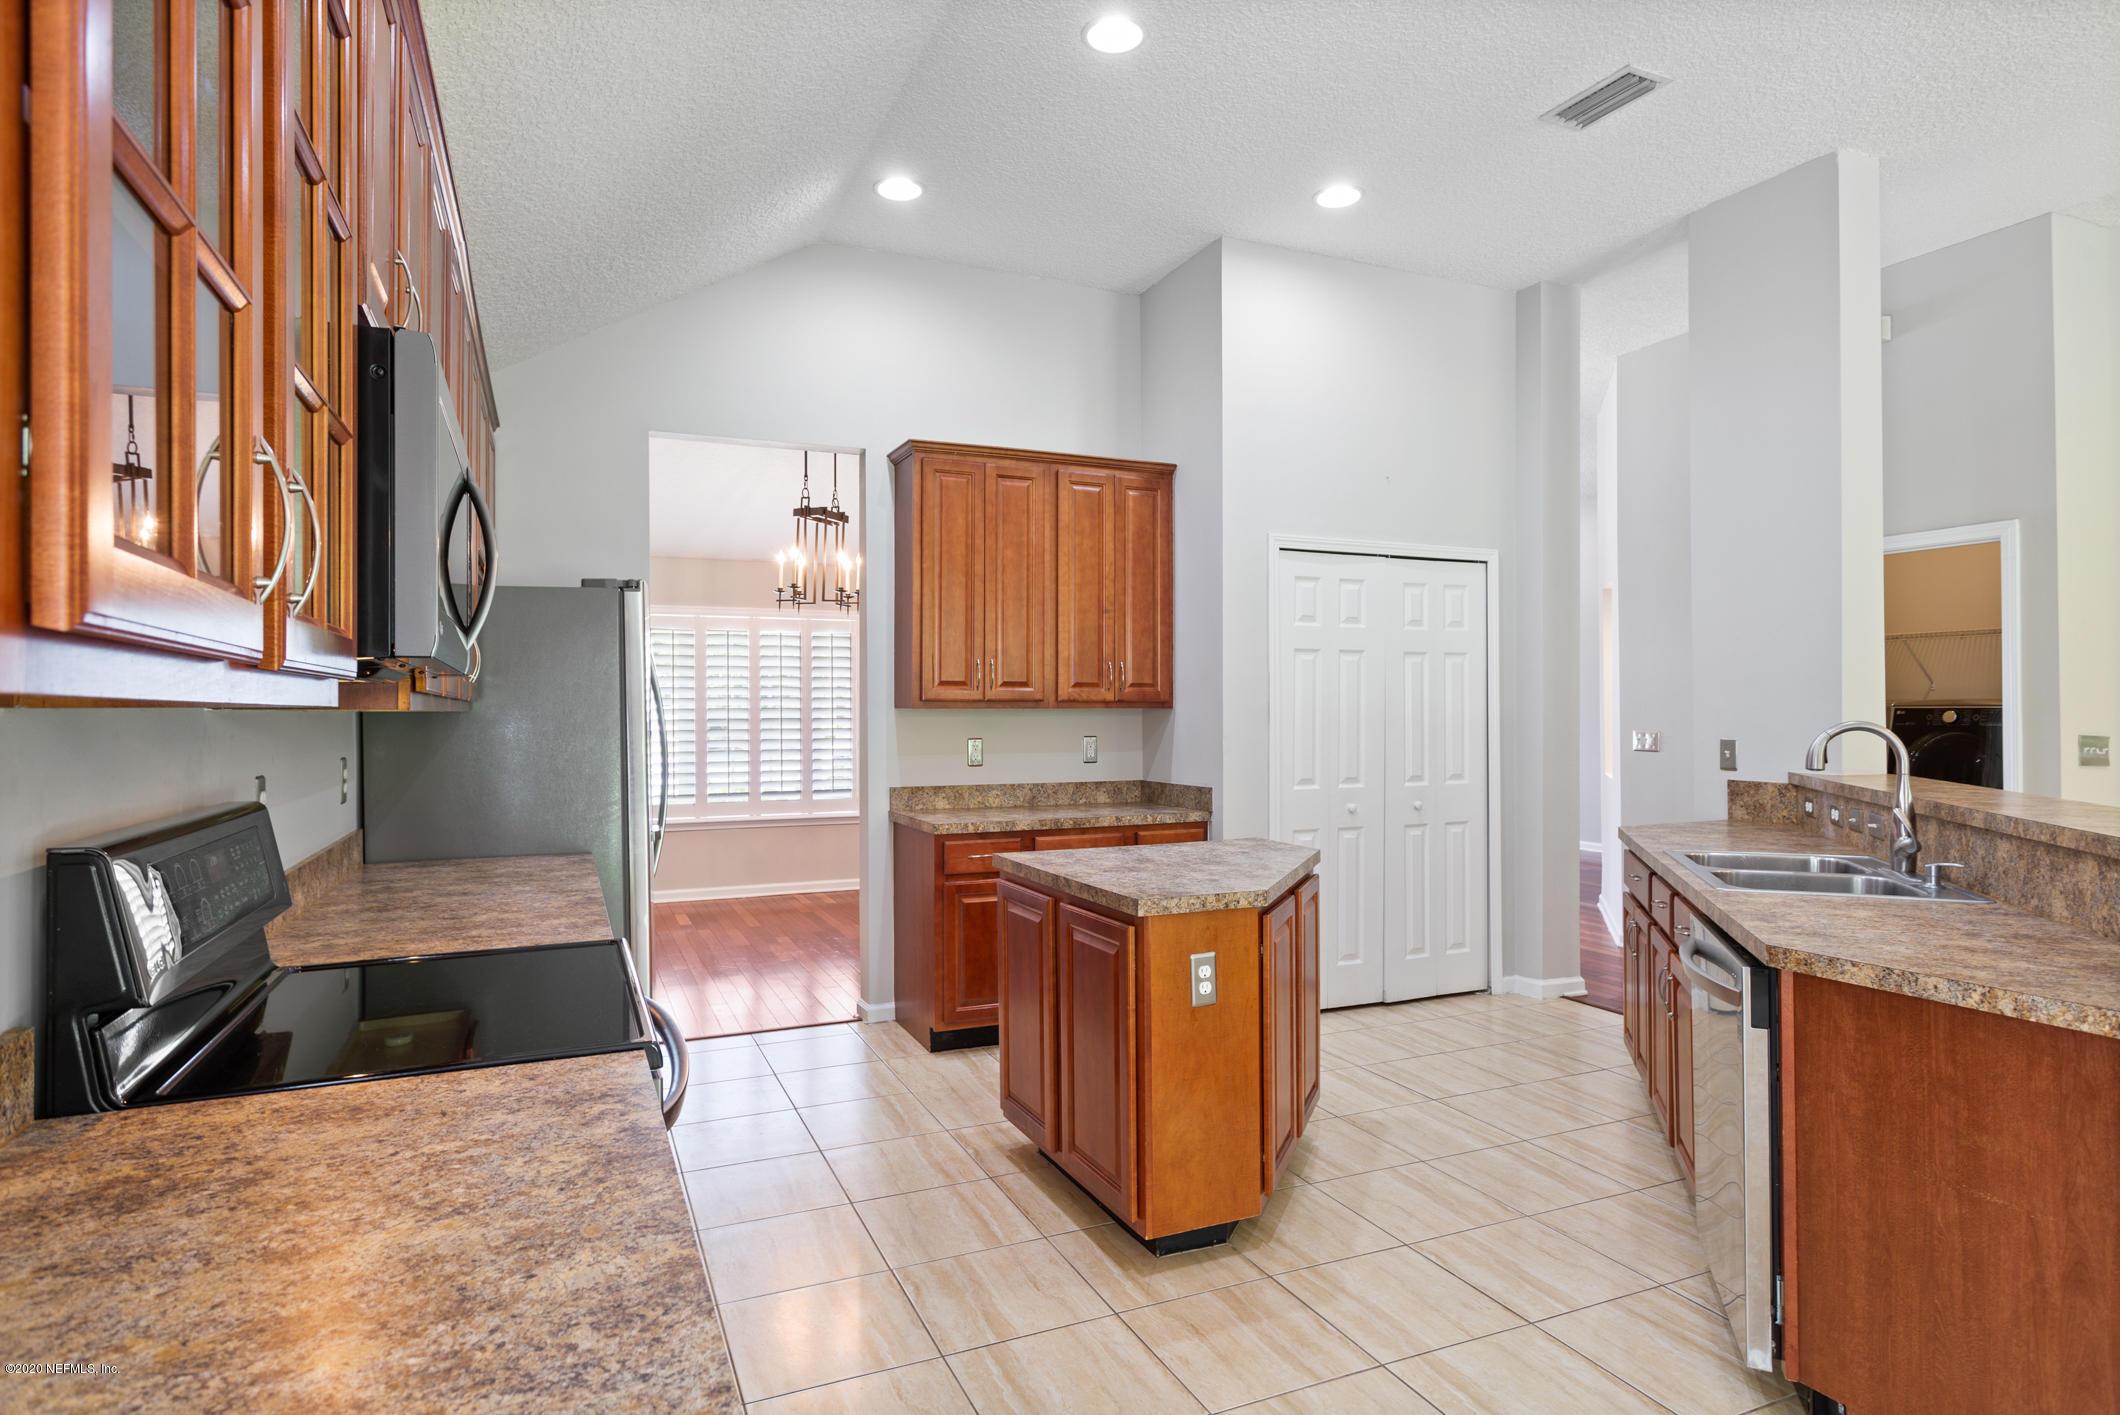 858 Thoroughbred, ORANGE PARK, FLORIDA 32065, 4 Bedrooms Bedrooms, ,2 BathroomsBathrooms,Residential,For sale,Thoroughbred,1064130